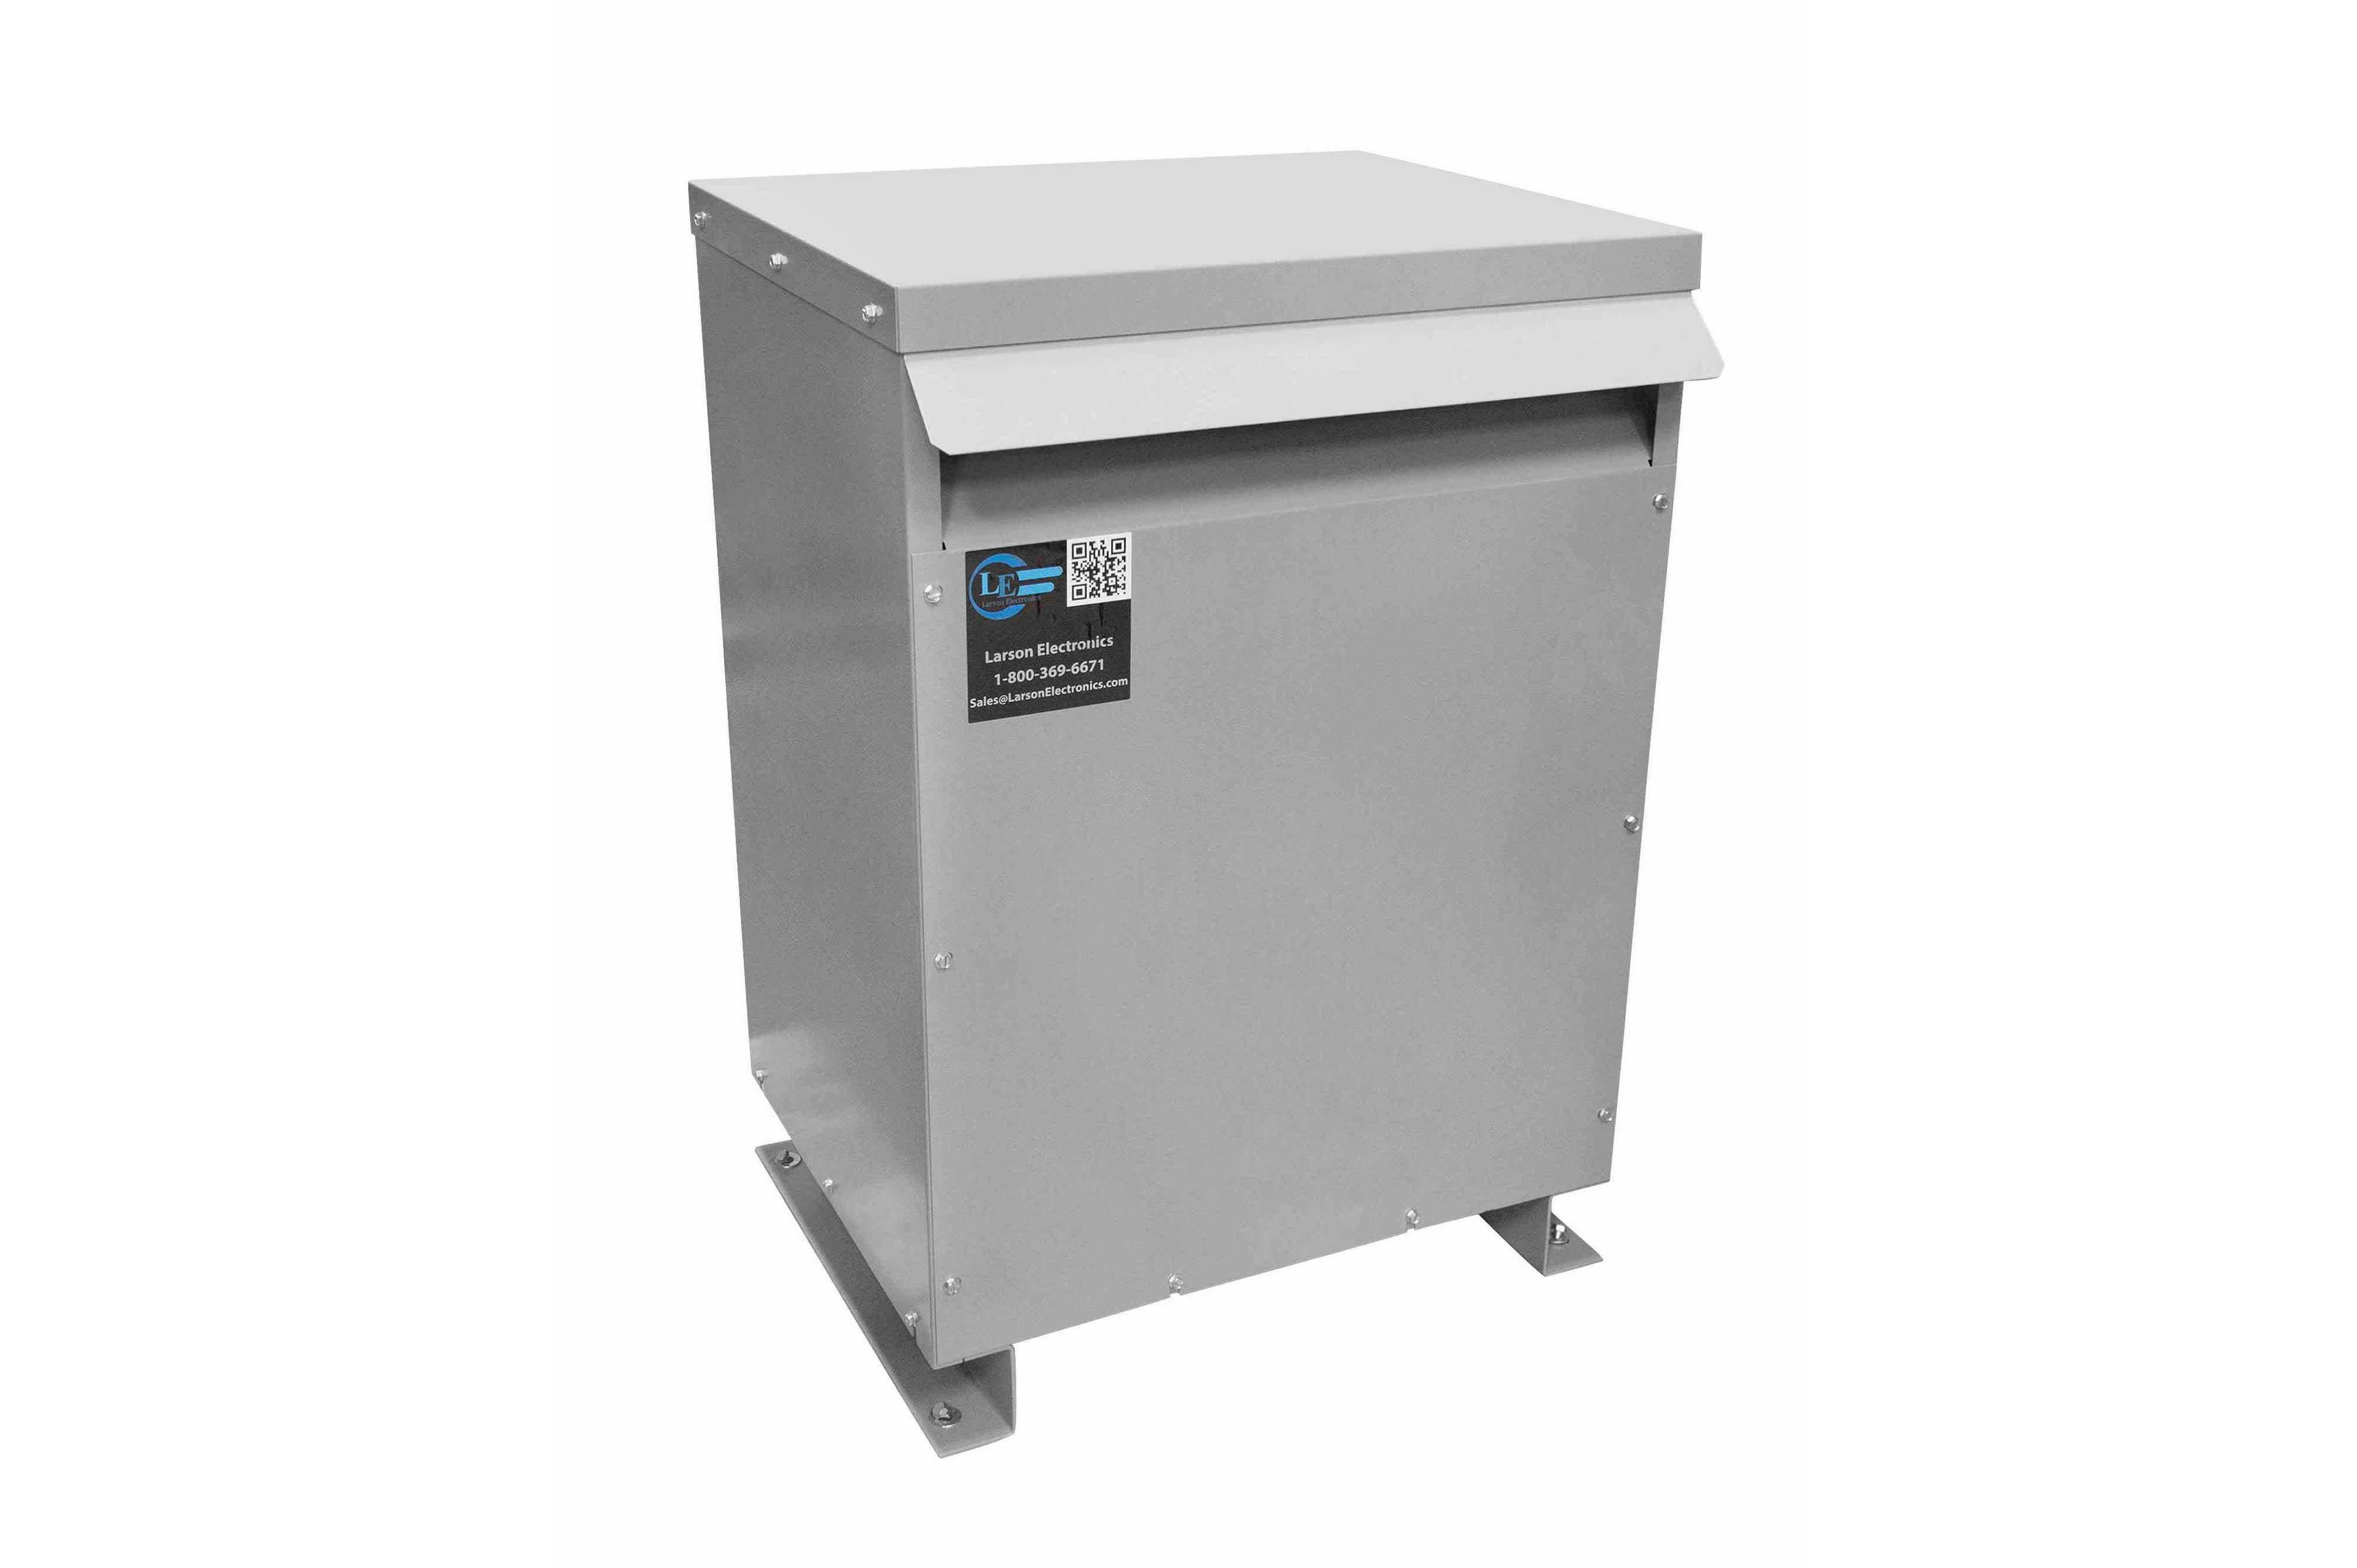 26 kVA 3PH Isolation Transformer, 460V Wye Primary, 600Y/347 Wye-N Secondary, N3R, Ventilated, 60 Hz